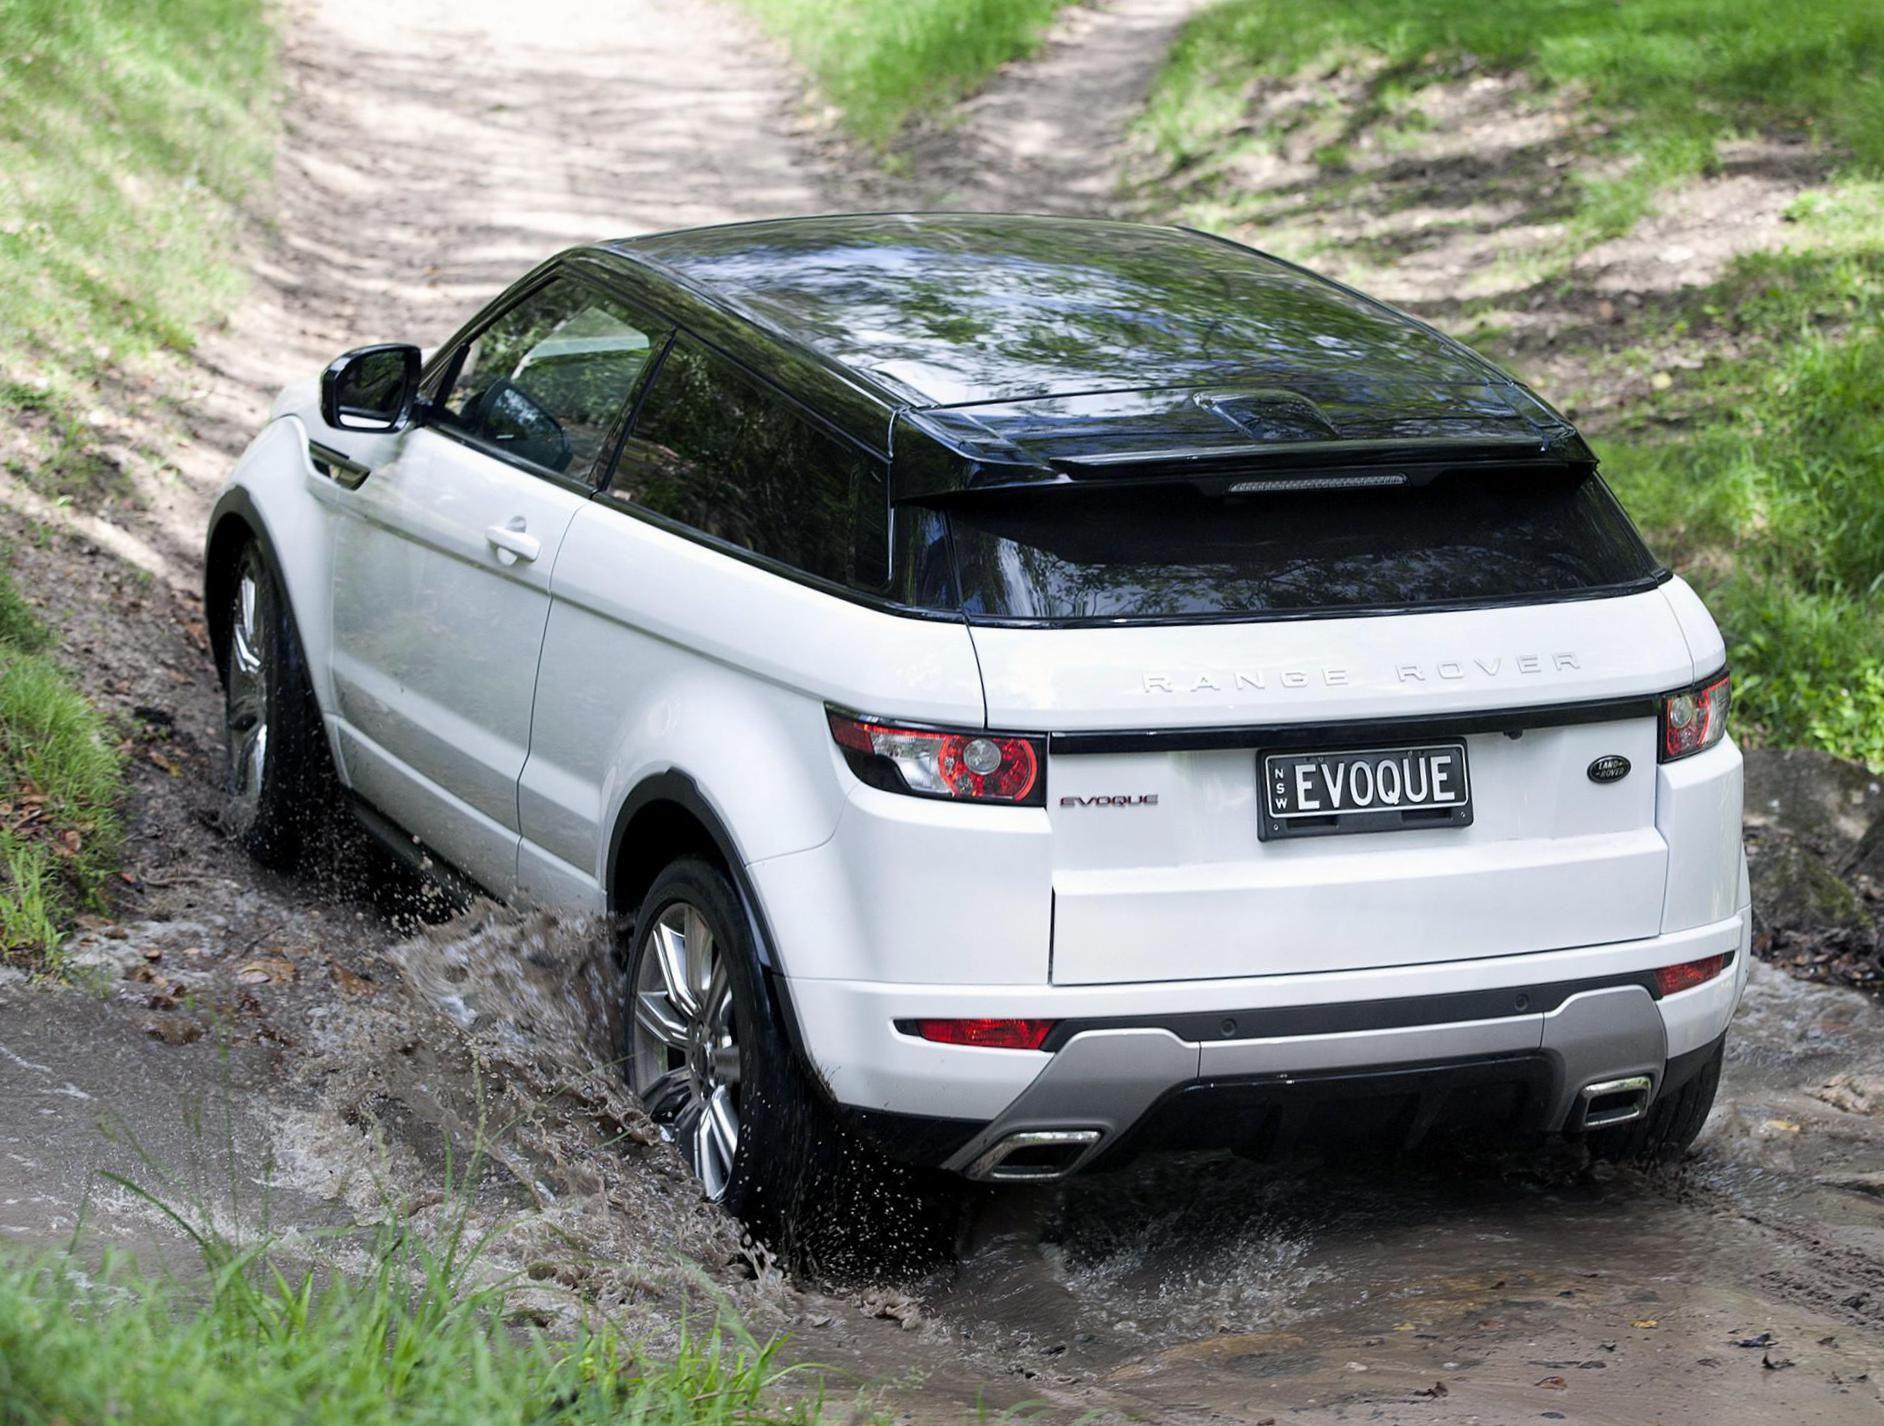 Land Rover Range Rover Evoque Coupe tuning